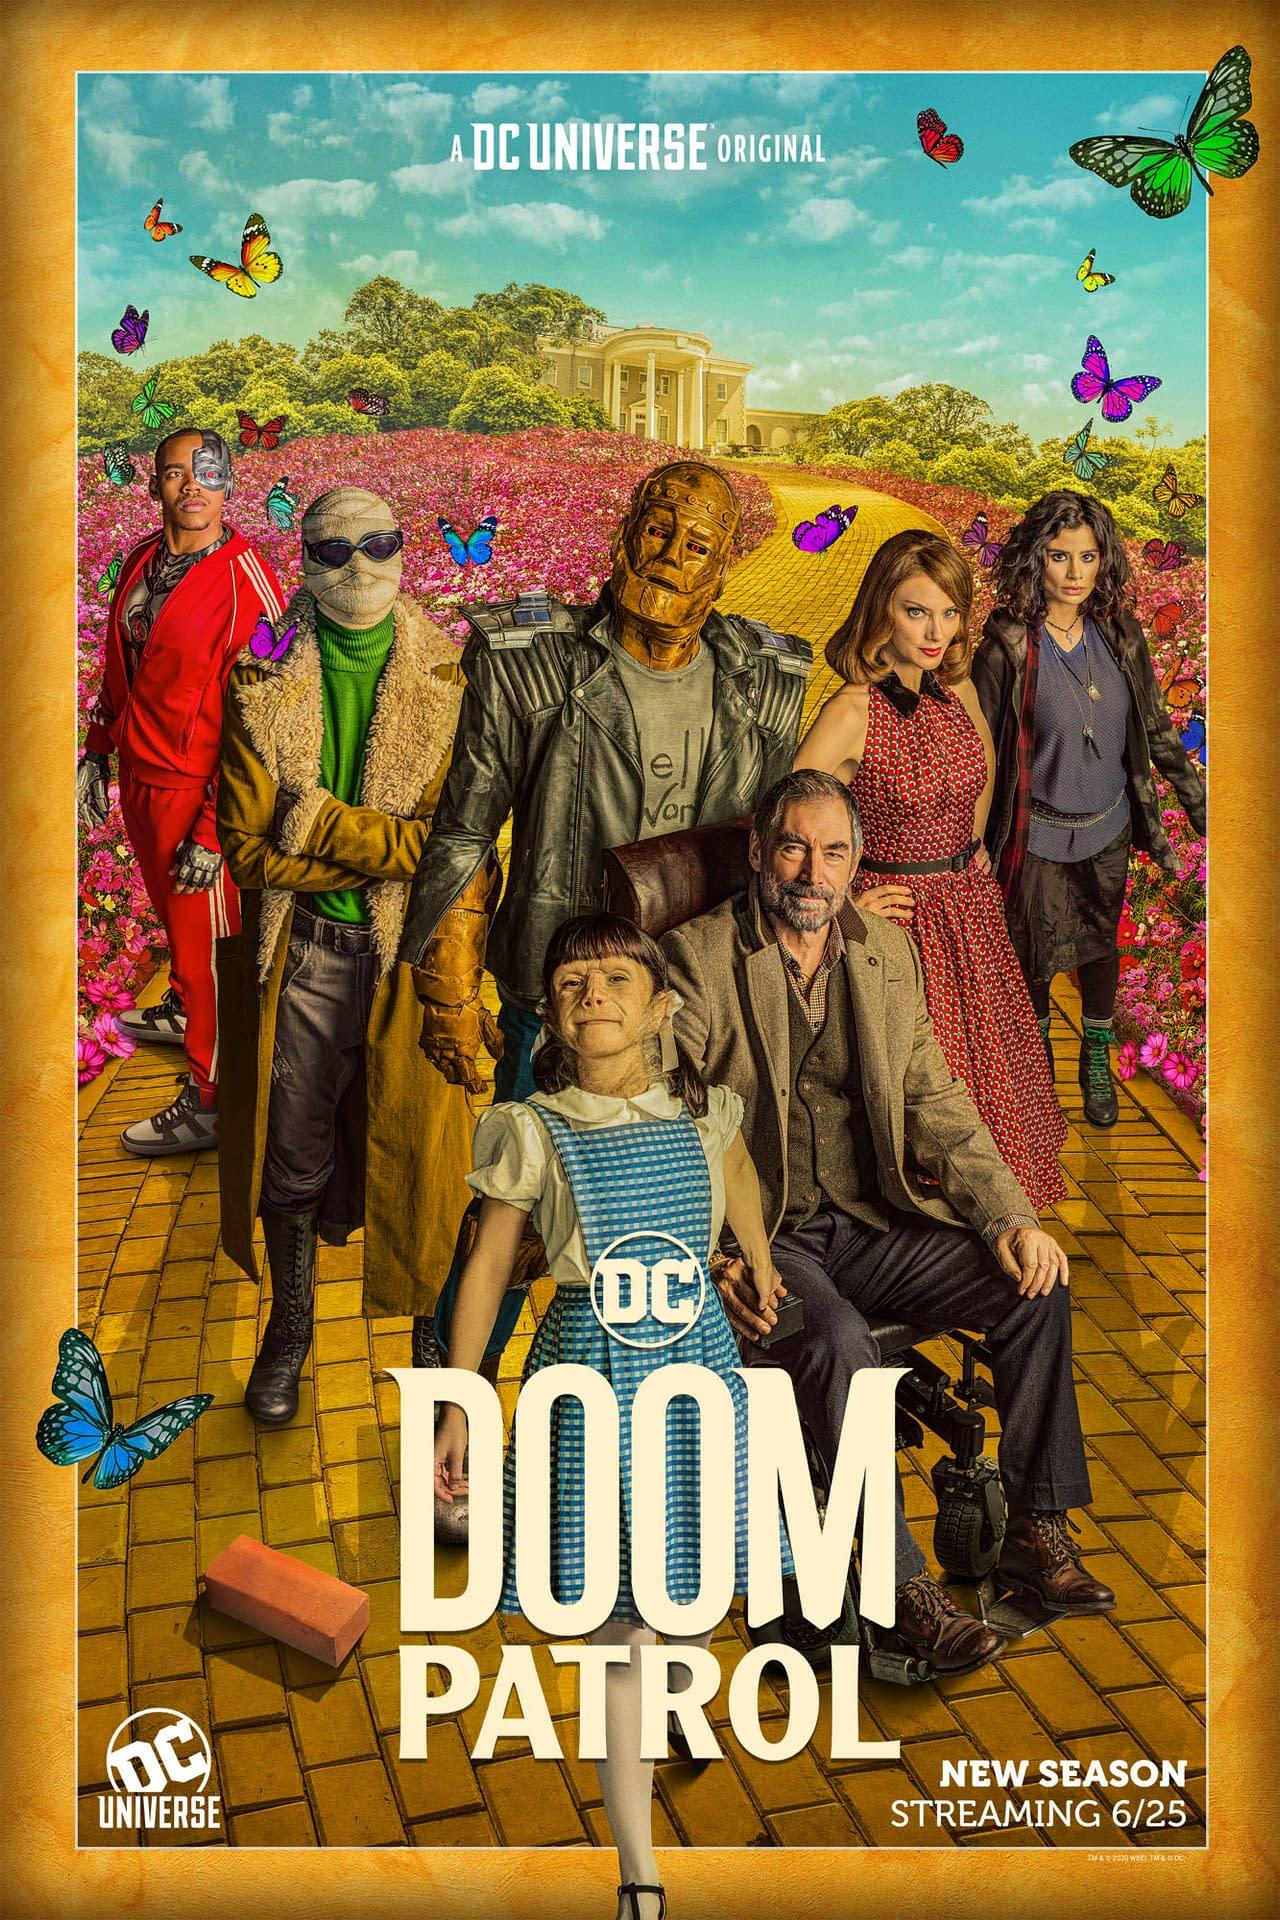 Doom Patrol Season 2 Extended Trailer Introduces Some ...